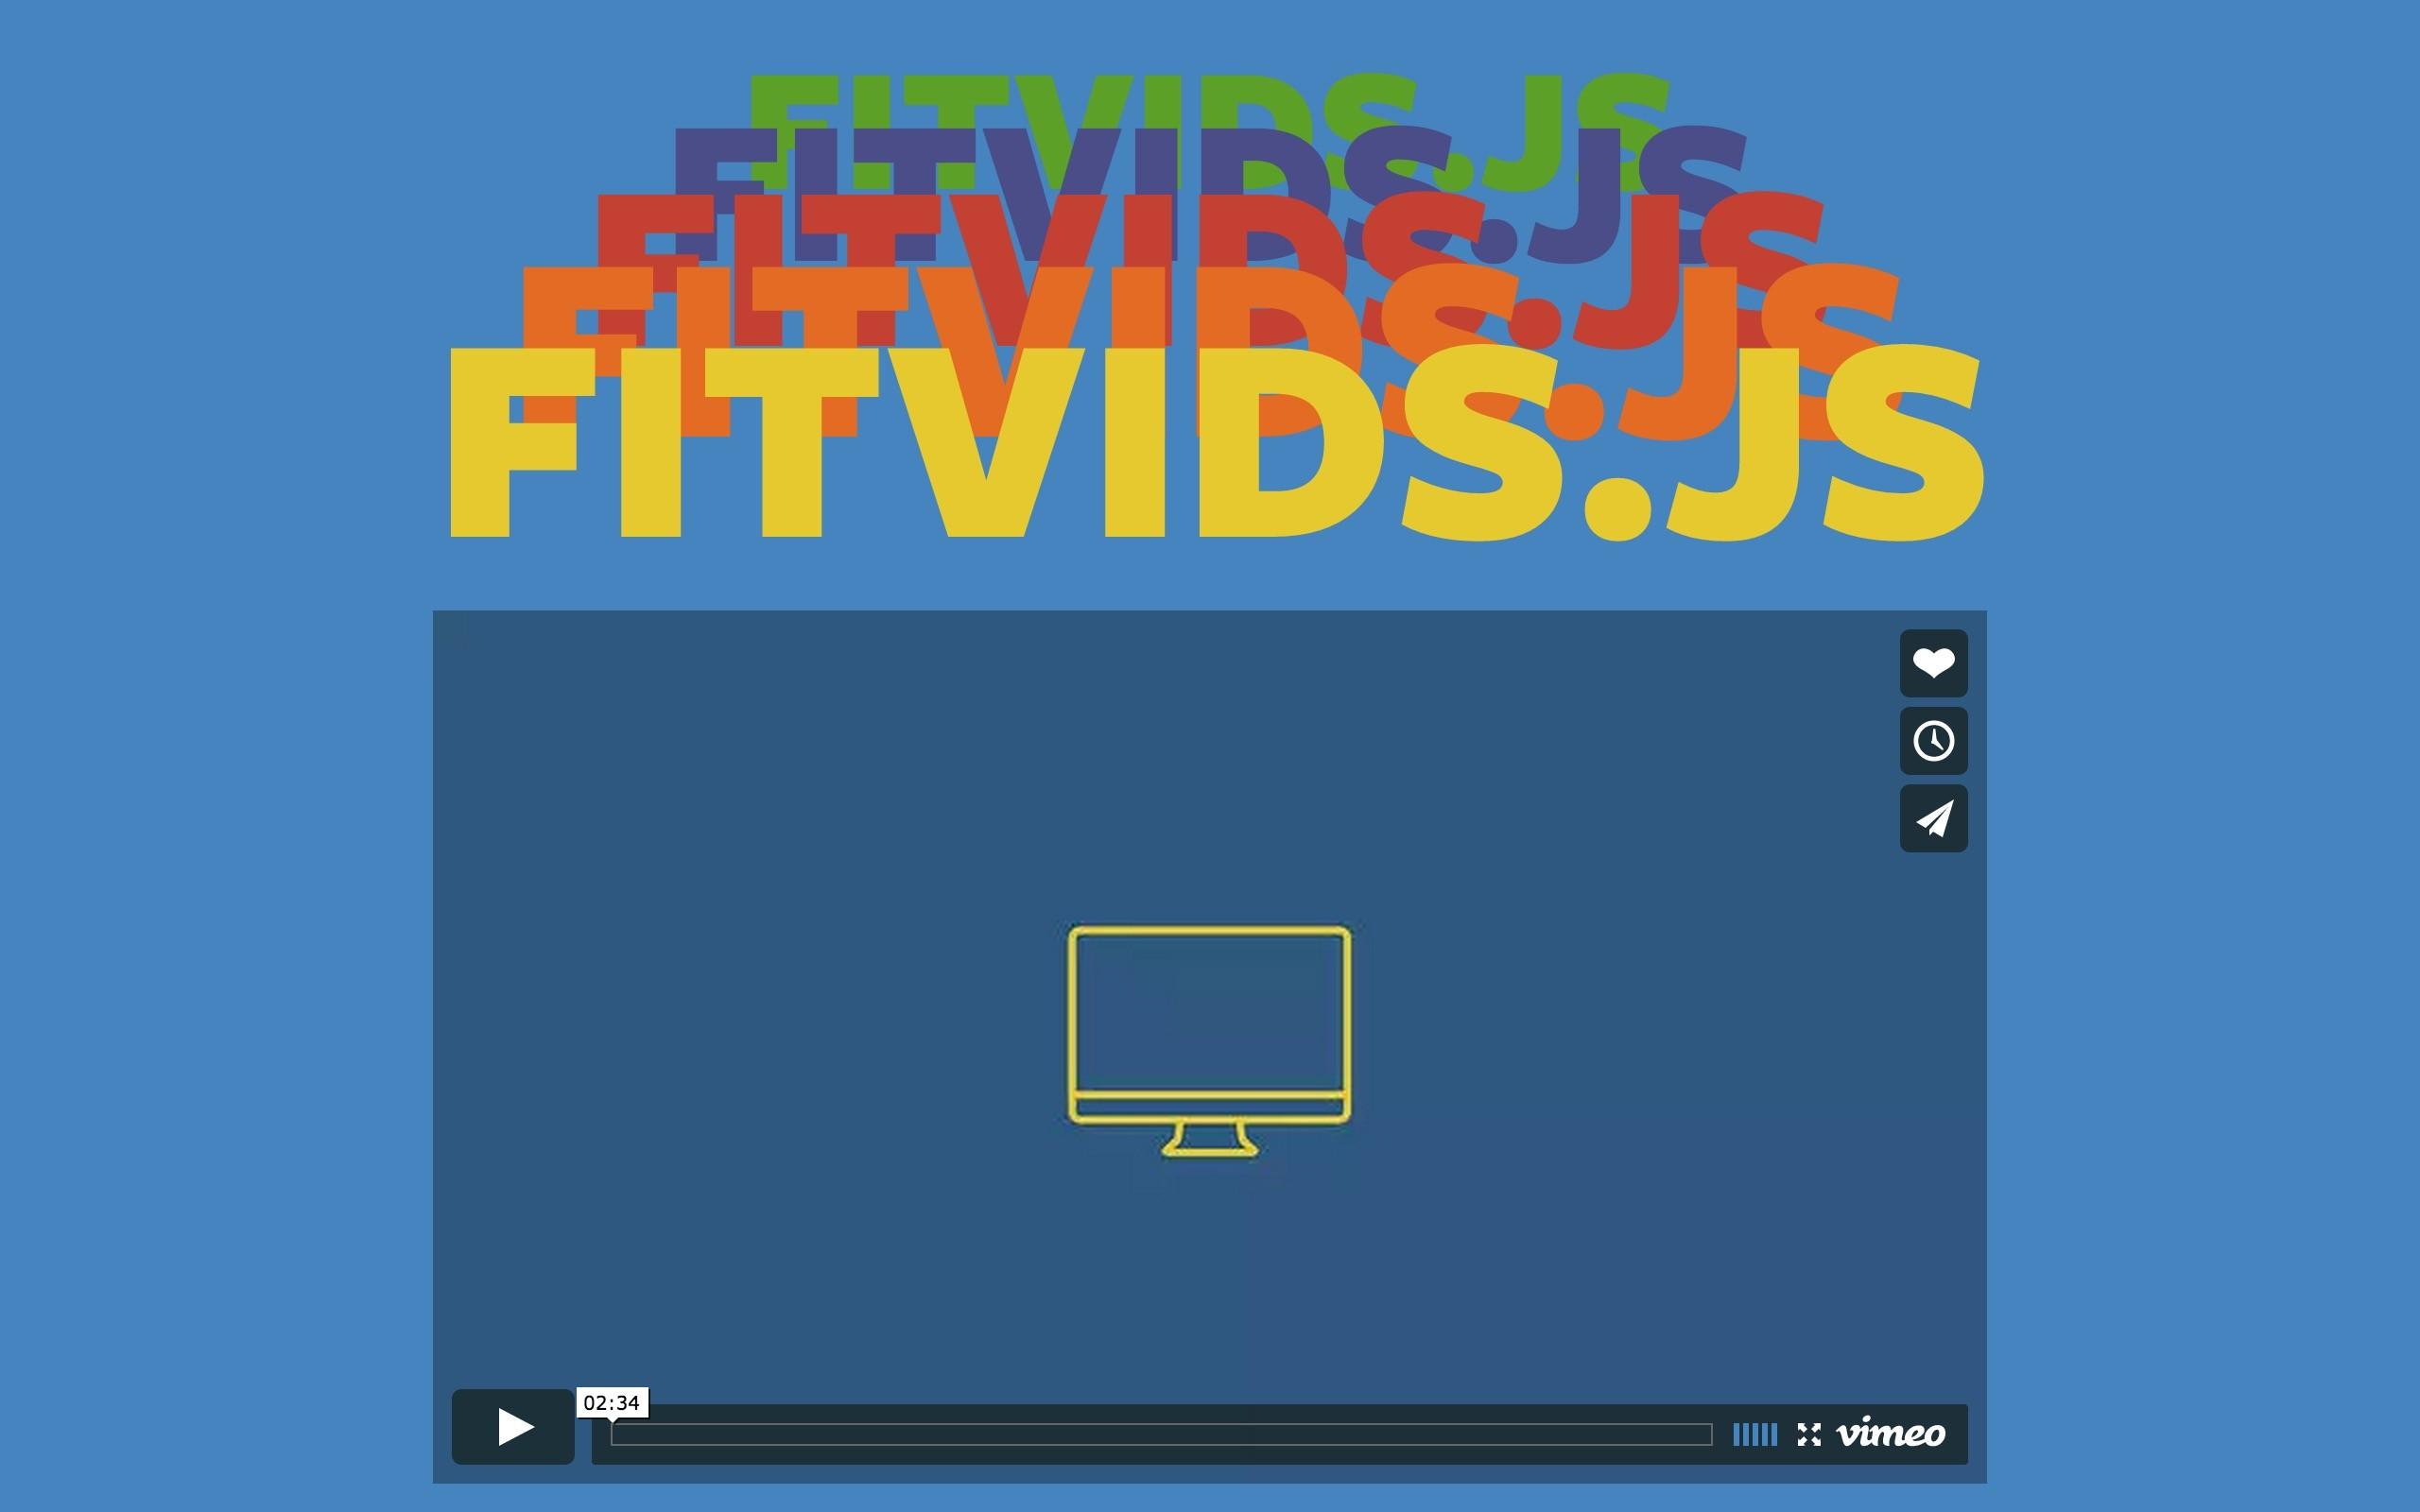 fitvids.jpg